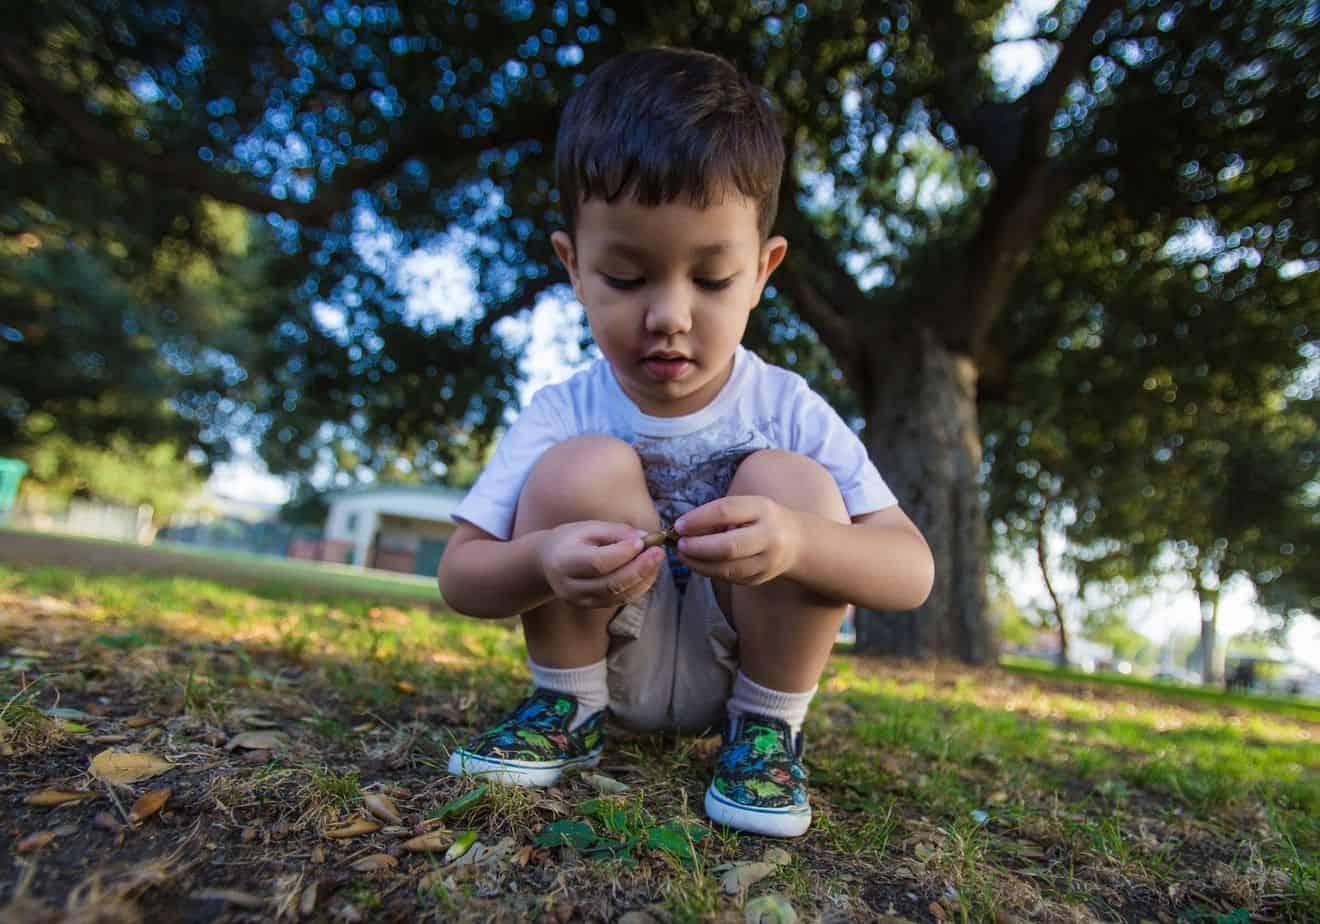 Summer Scavenger Hunt Activity For Toddlers or Preschoolers